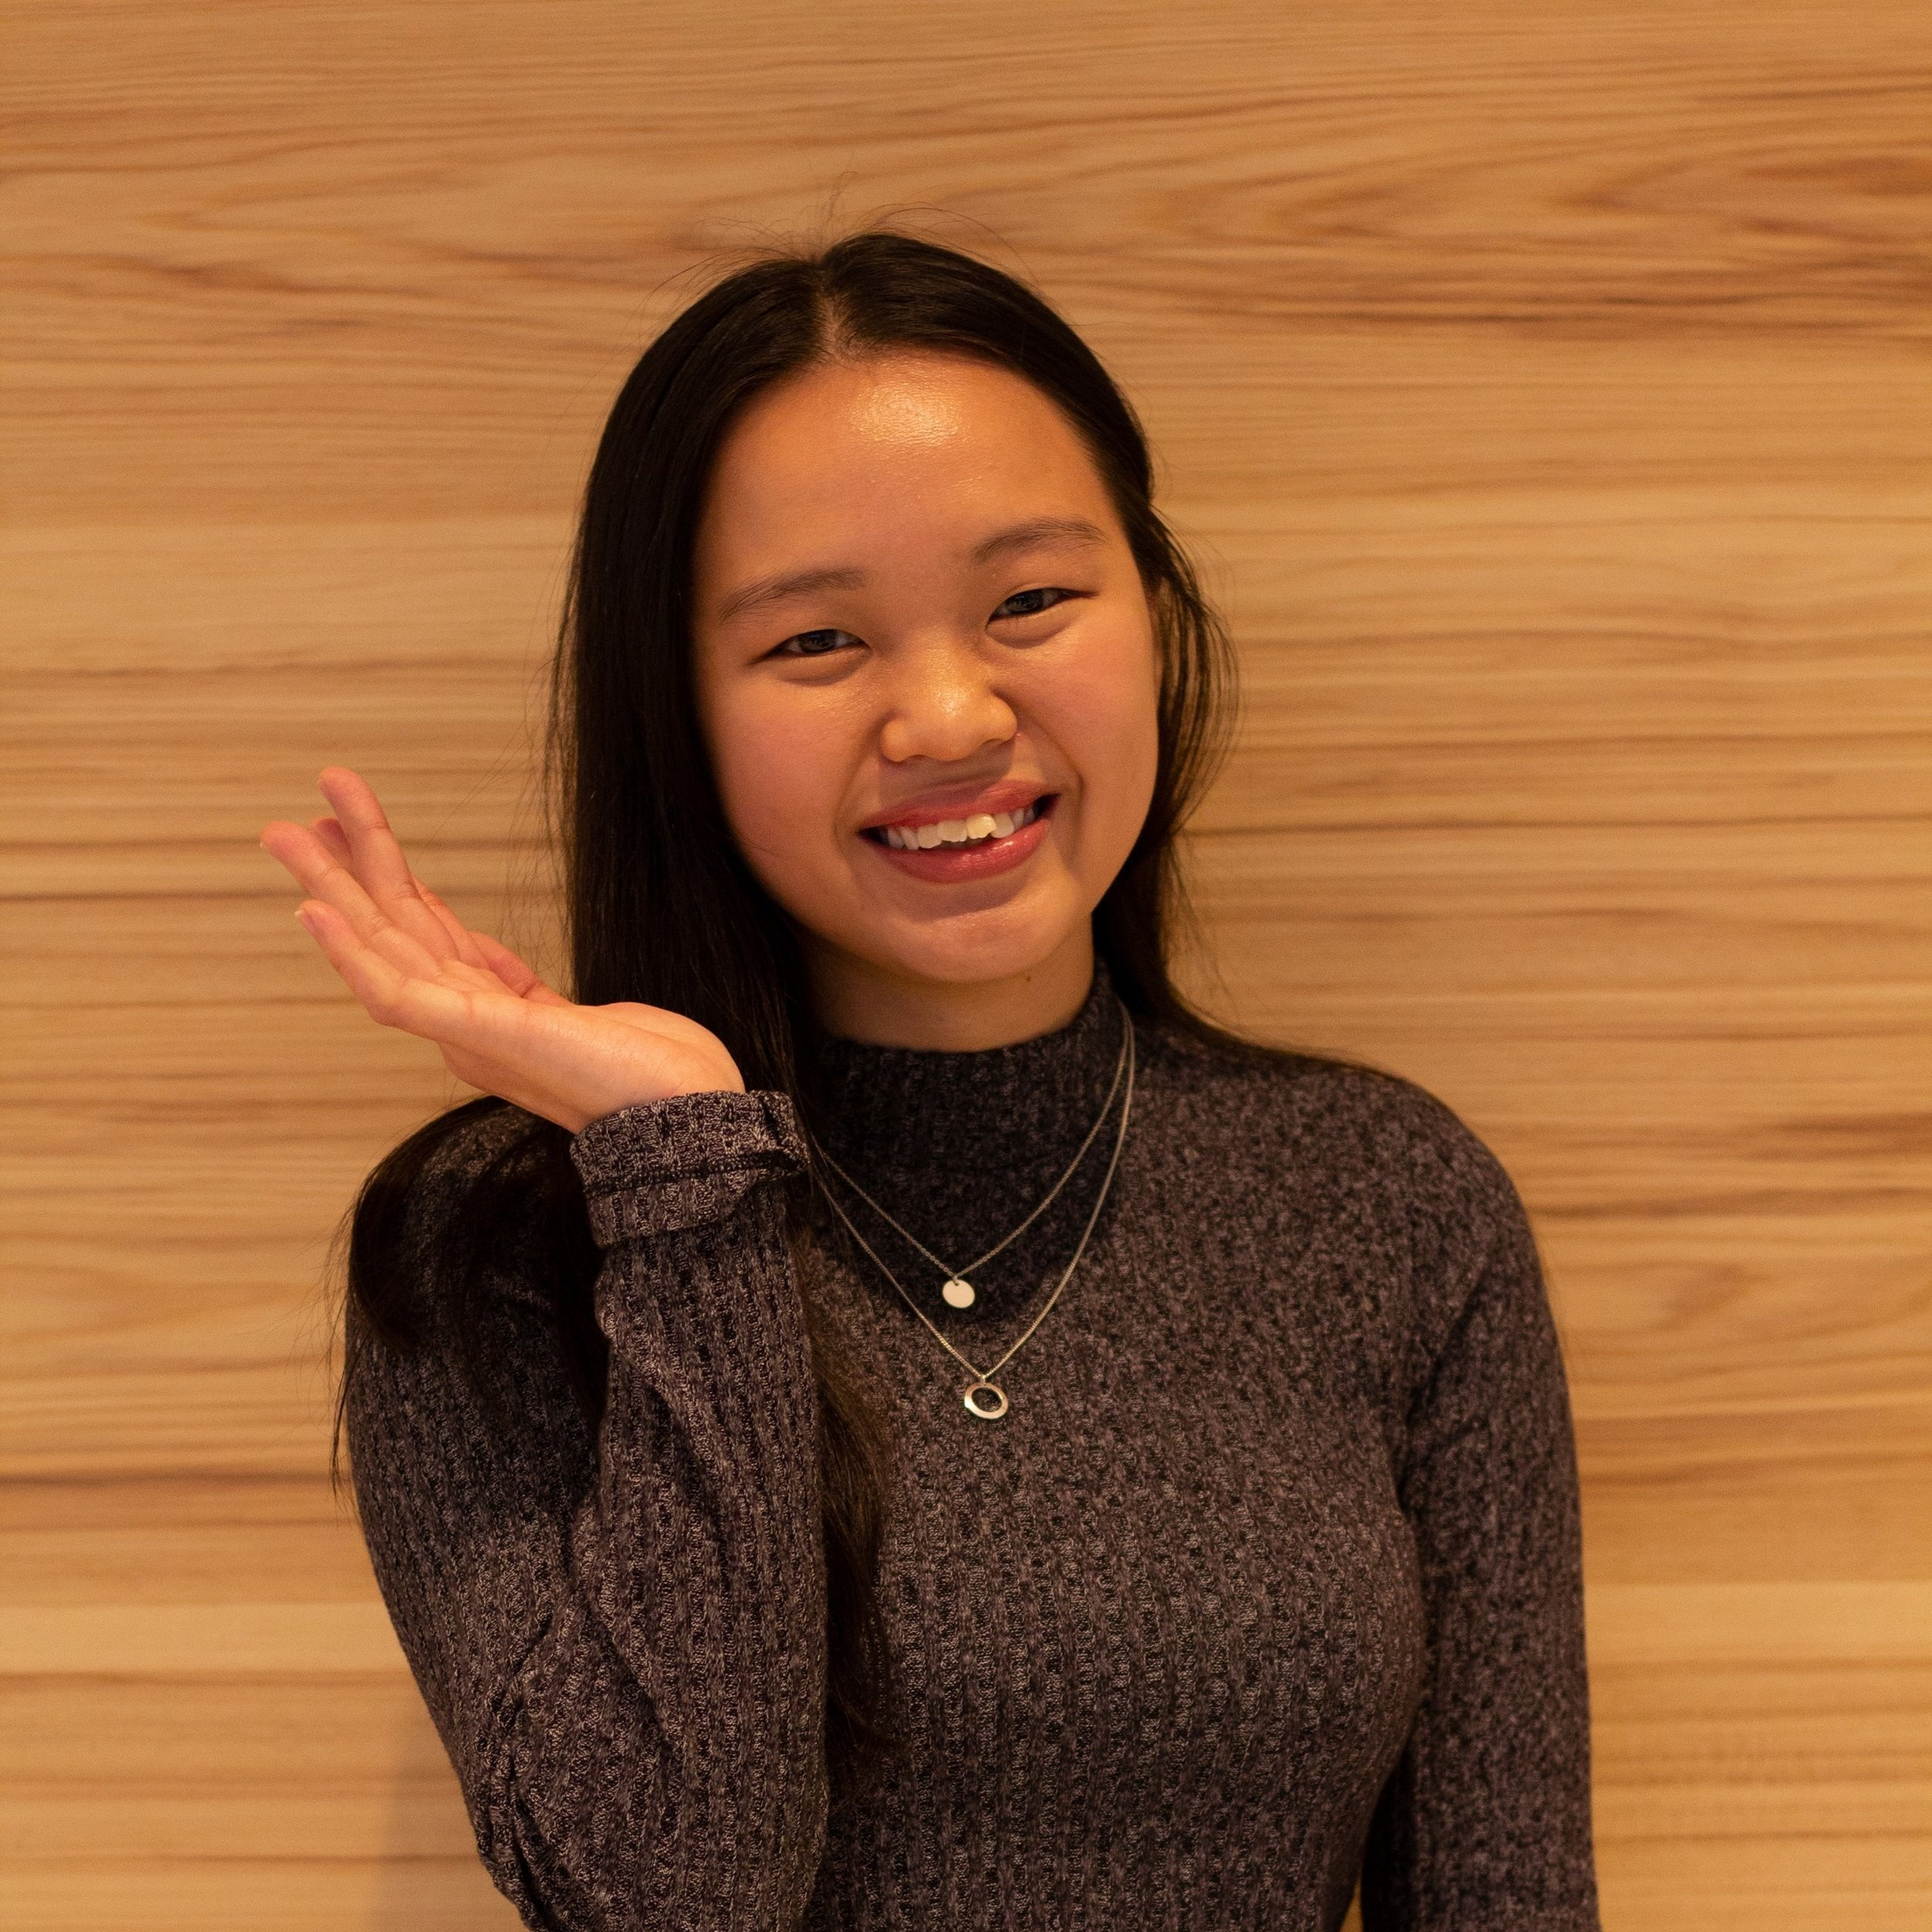 Alicia Ngoc Phan - Director of External Affairs